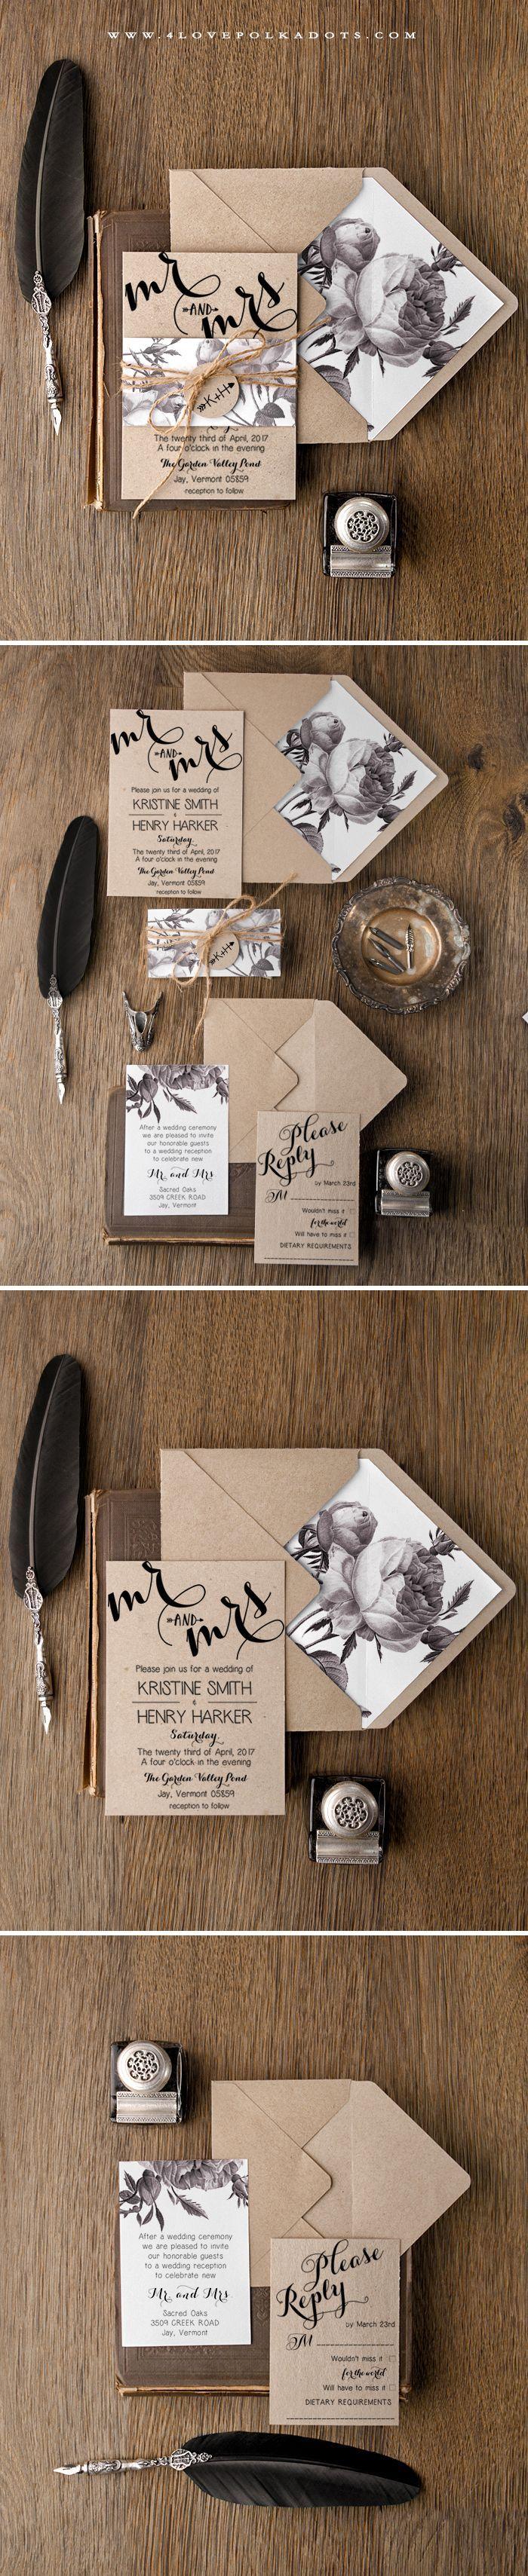 wedding invitation inside message%0A Handmade Wedding Invitation  Eco Papers  Floral Printing  u     Calligraphy  writing  weddingideas  boho